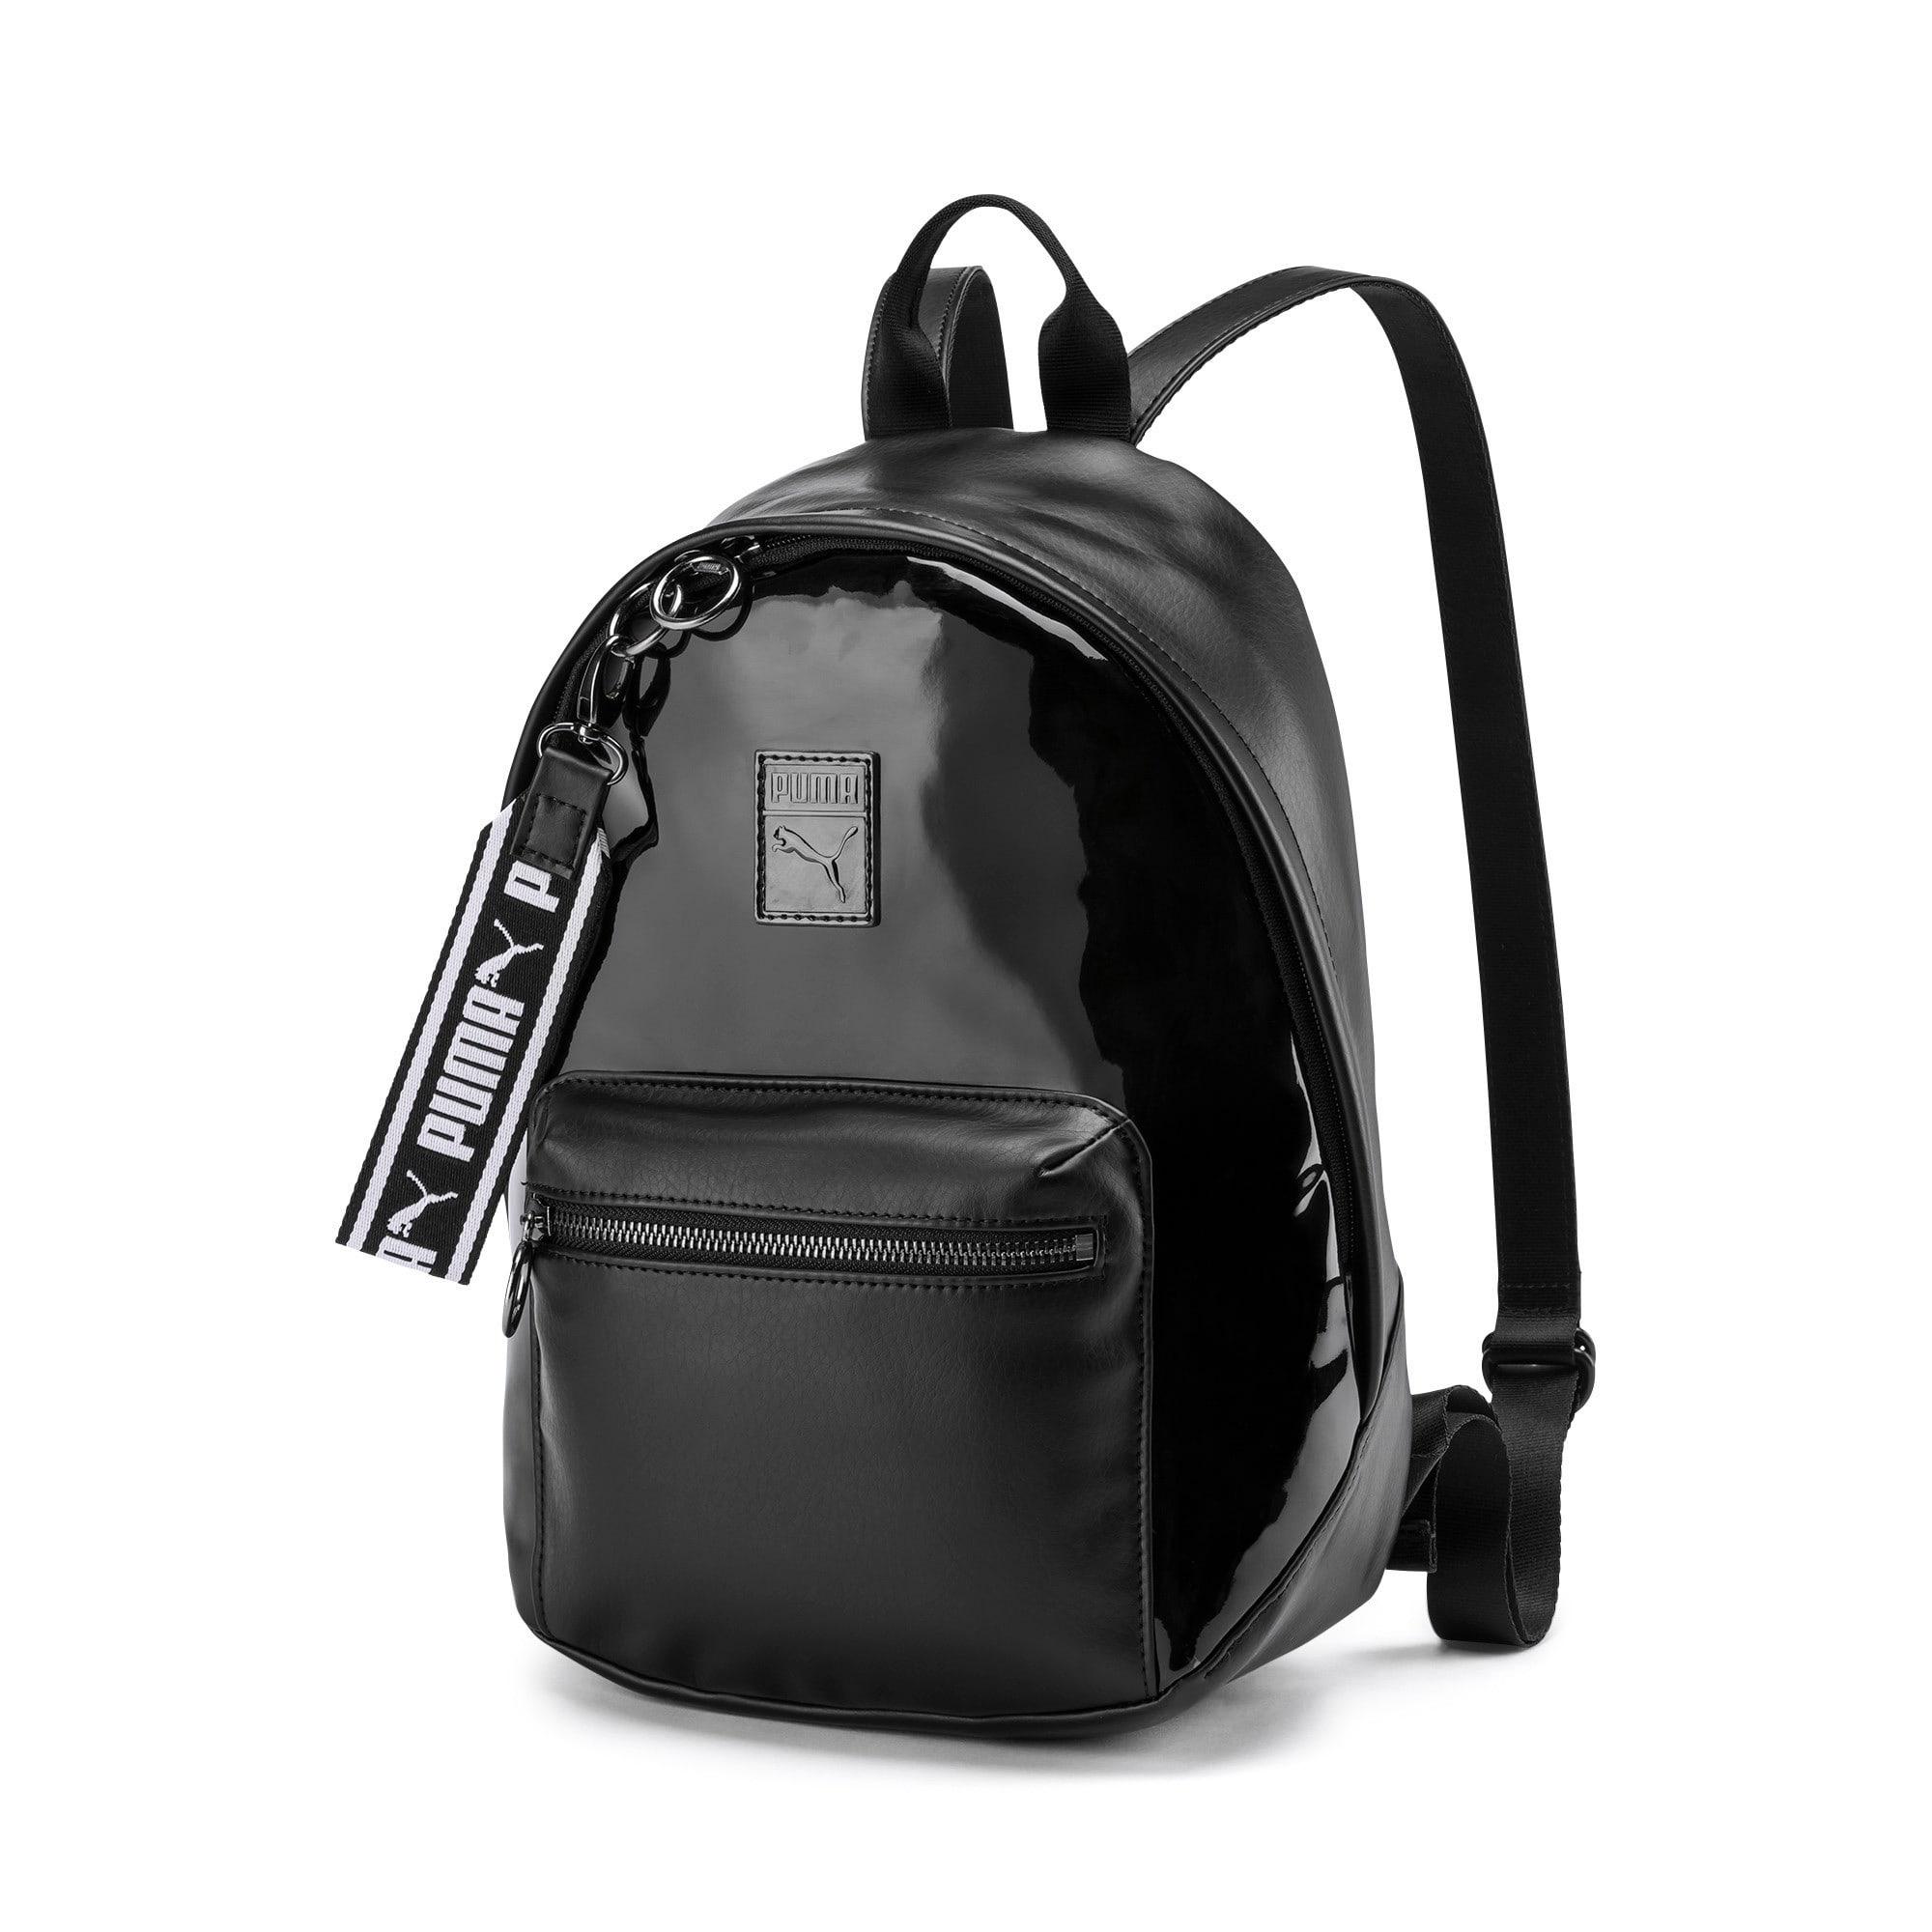 Thumbnail 1 of Premium Women's Backpack, Puma Black, medium-IND